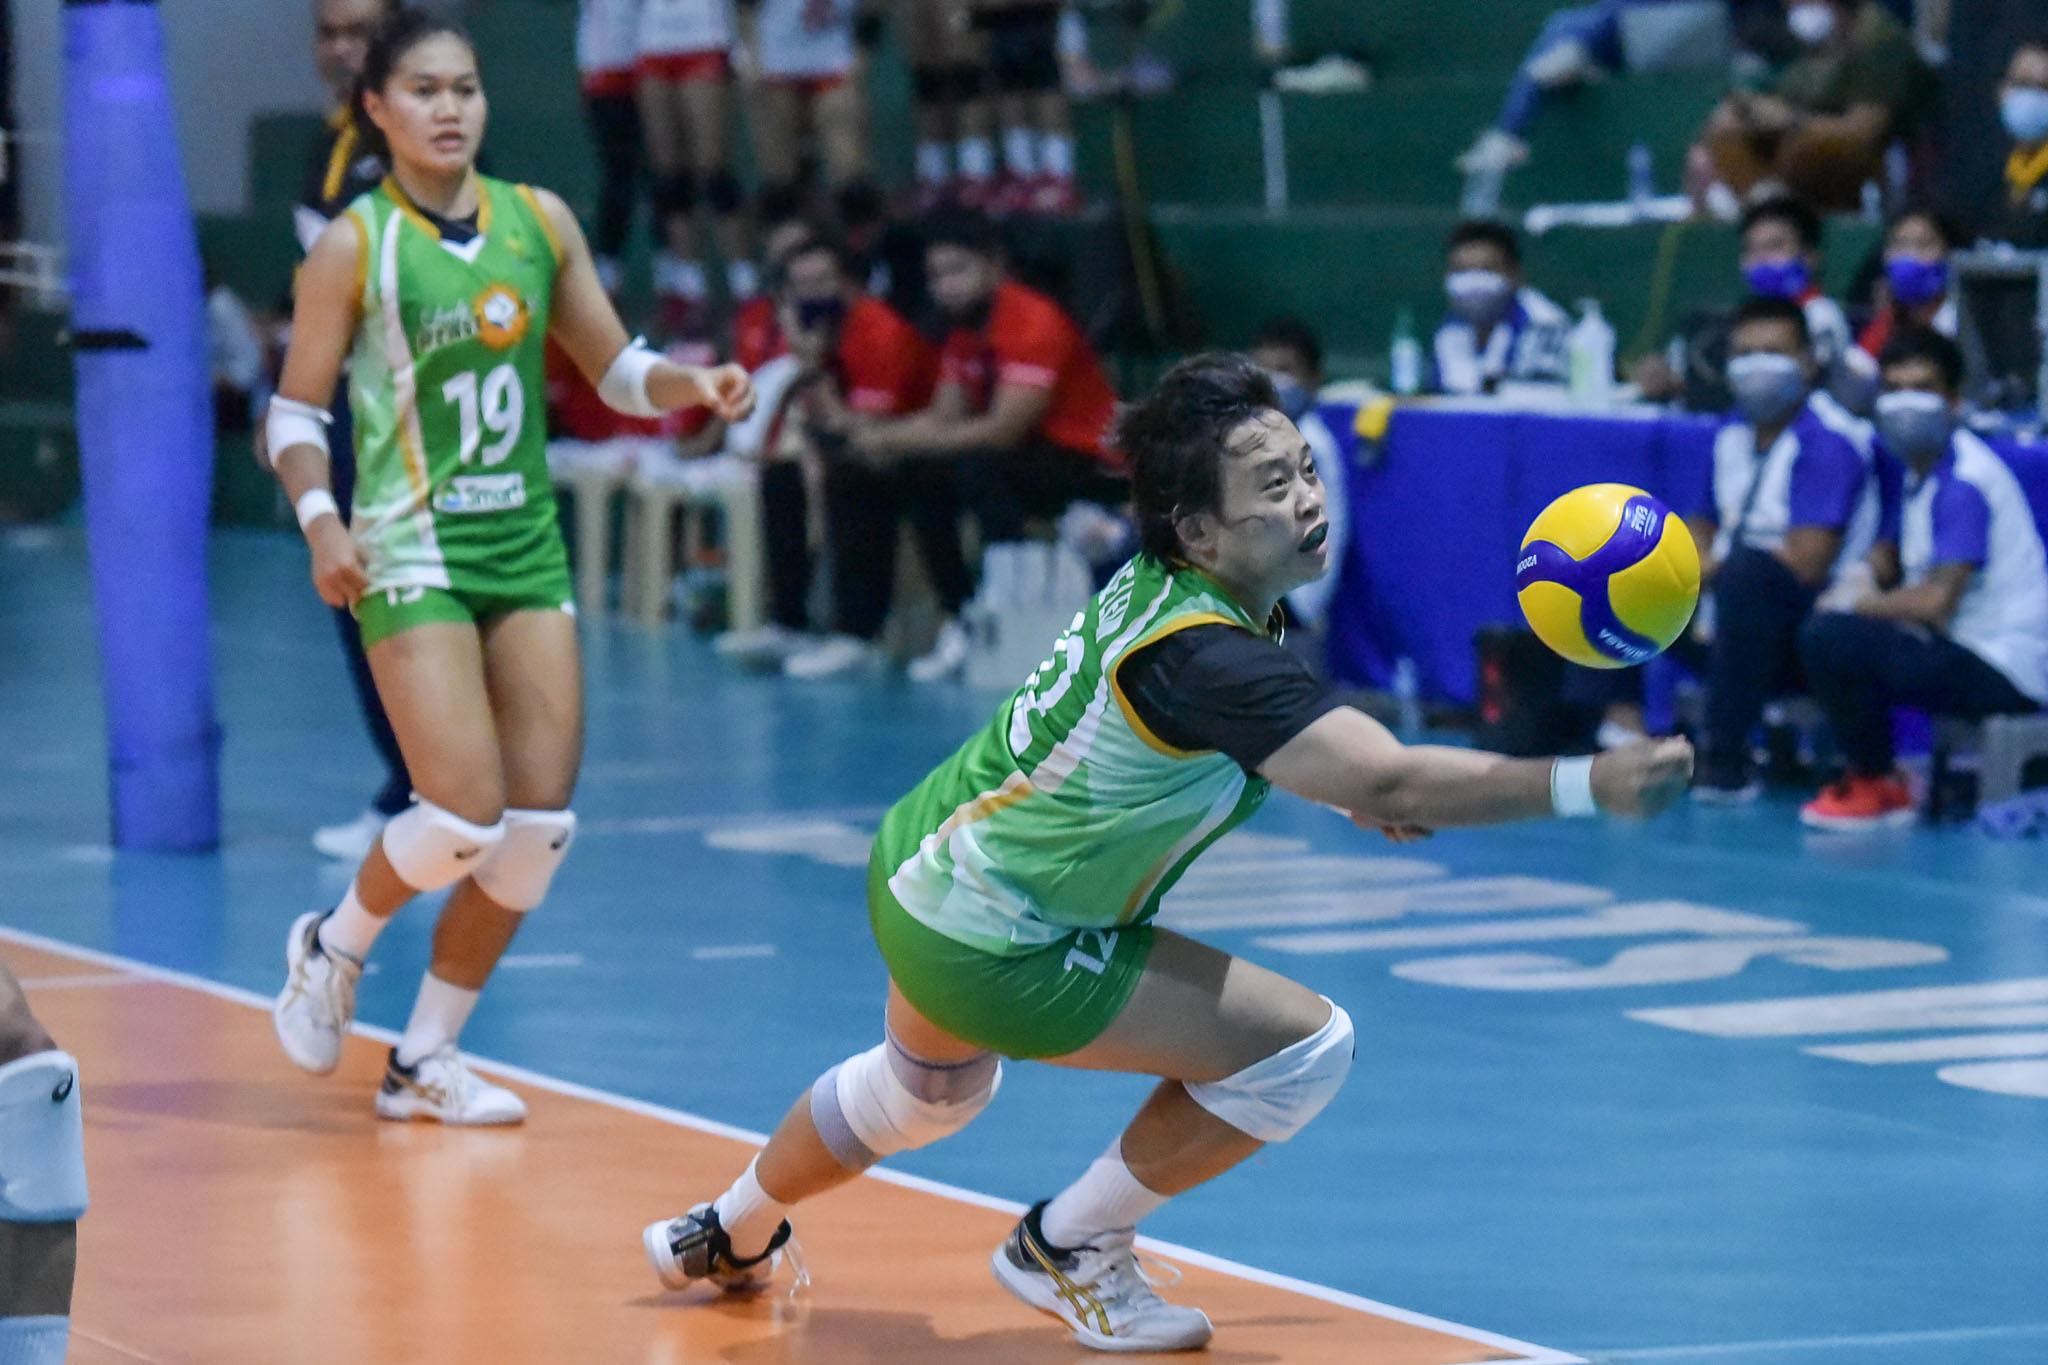 2021-PVL-Open-Sta.-Lucia-vs.-Petrogazz-Rubie-De-Leon-8908 Rubie De Leon tapped as asst coach for Sta. Lucia News PVL Volleyball  - philippine sports news